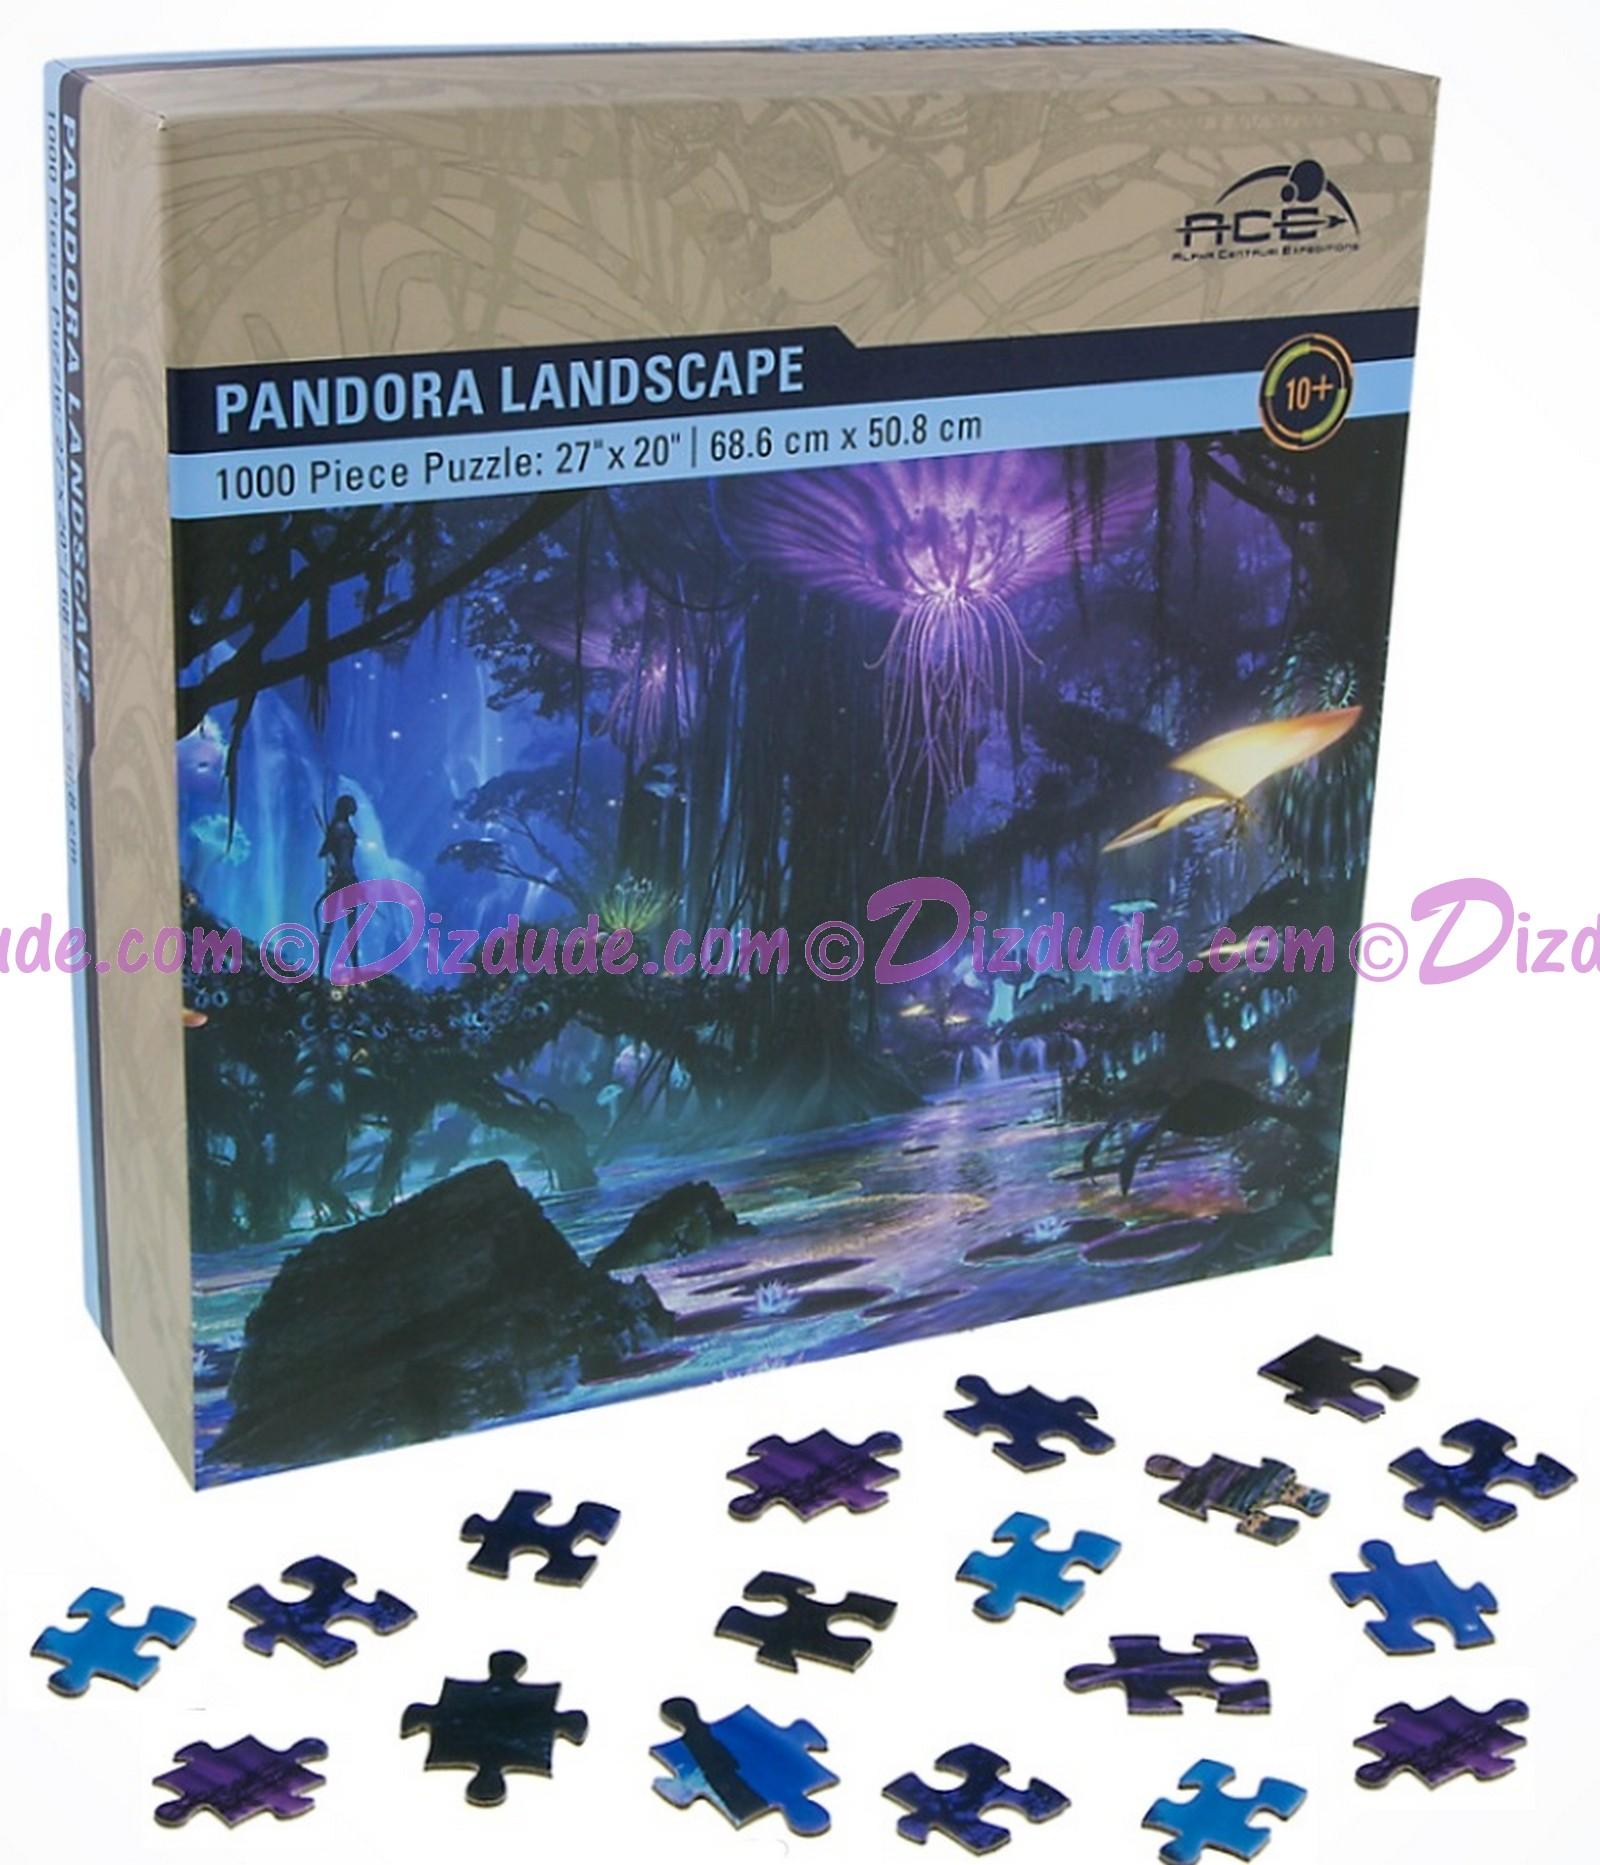 Avatar Pandora Landscape 1000 Piece Jigsaw Puzzle - Disney Pandora – The World of Avatar